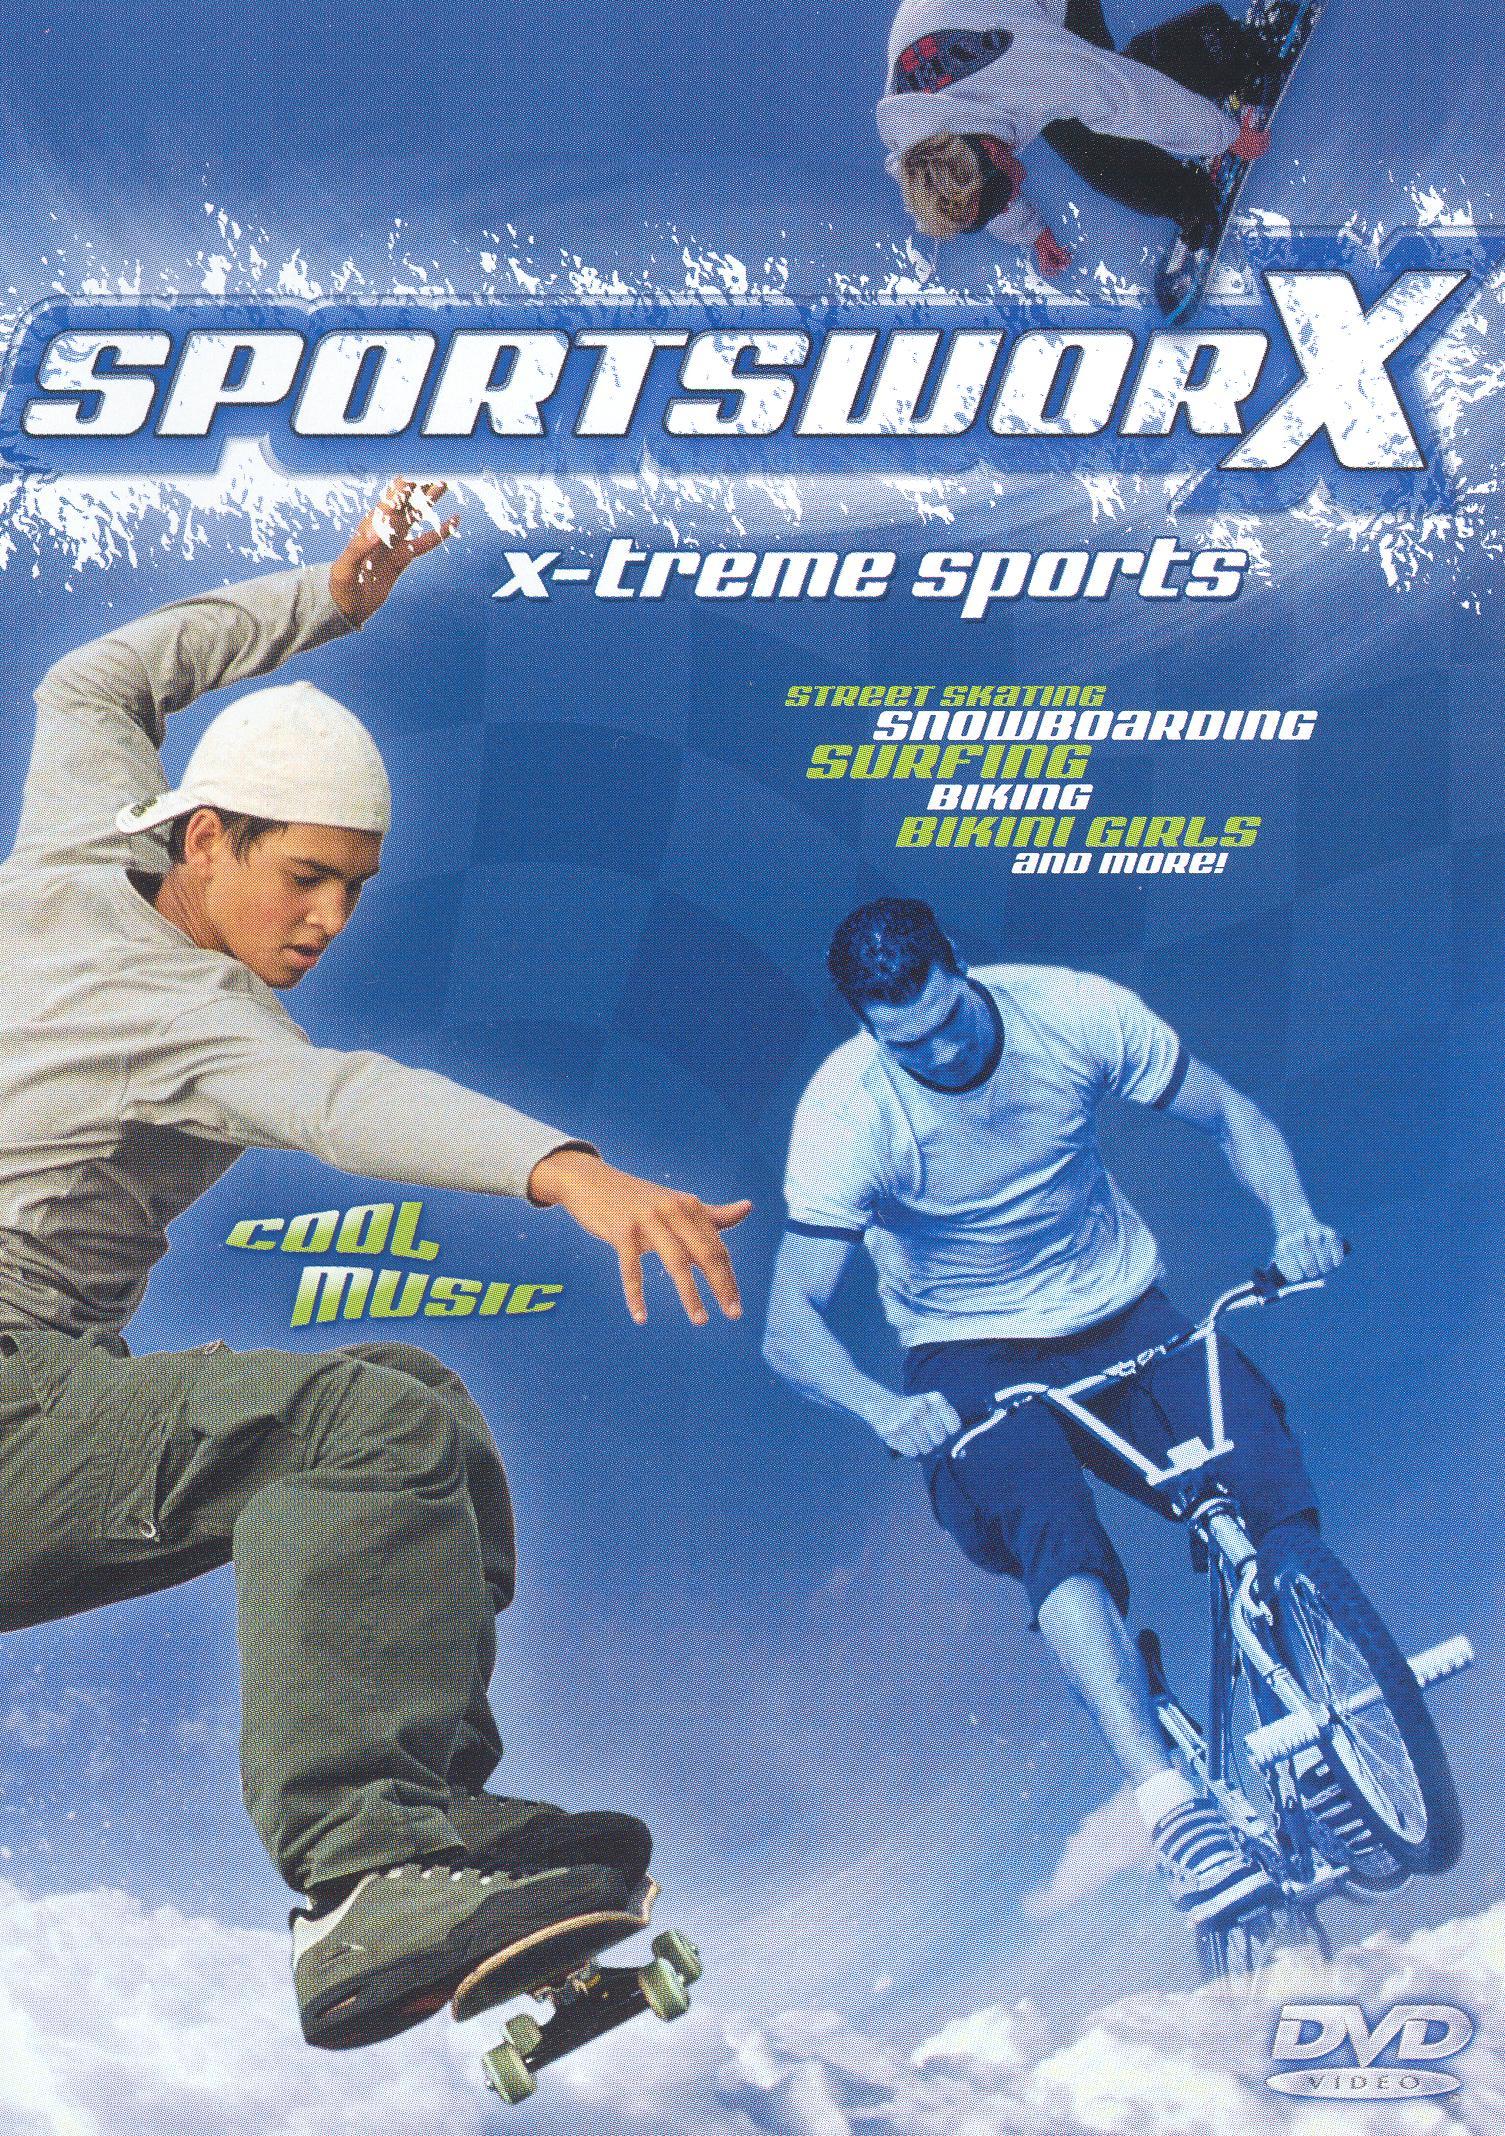 Sportsworx